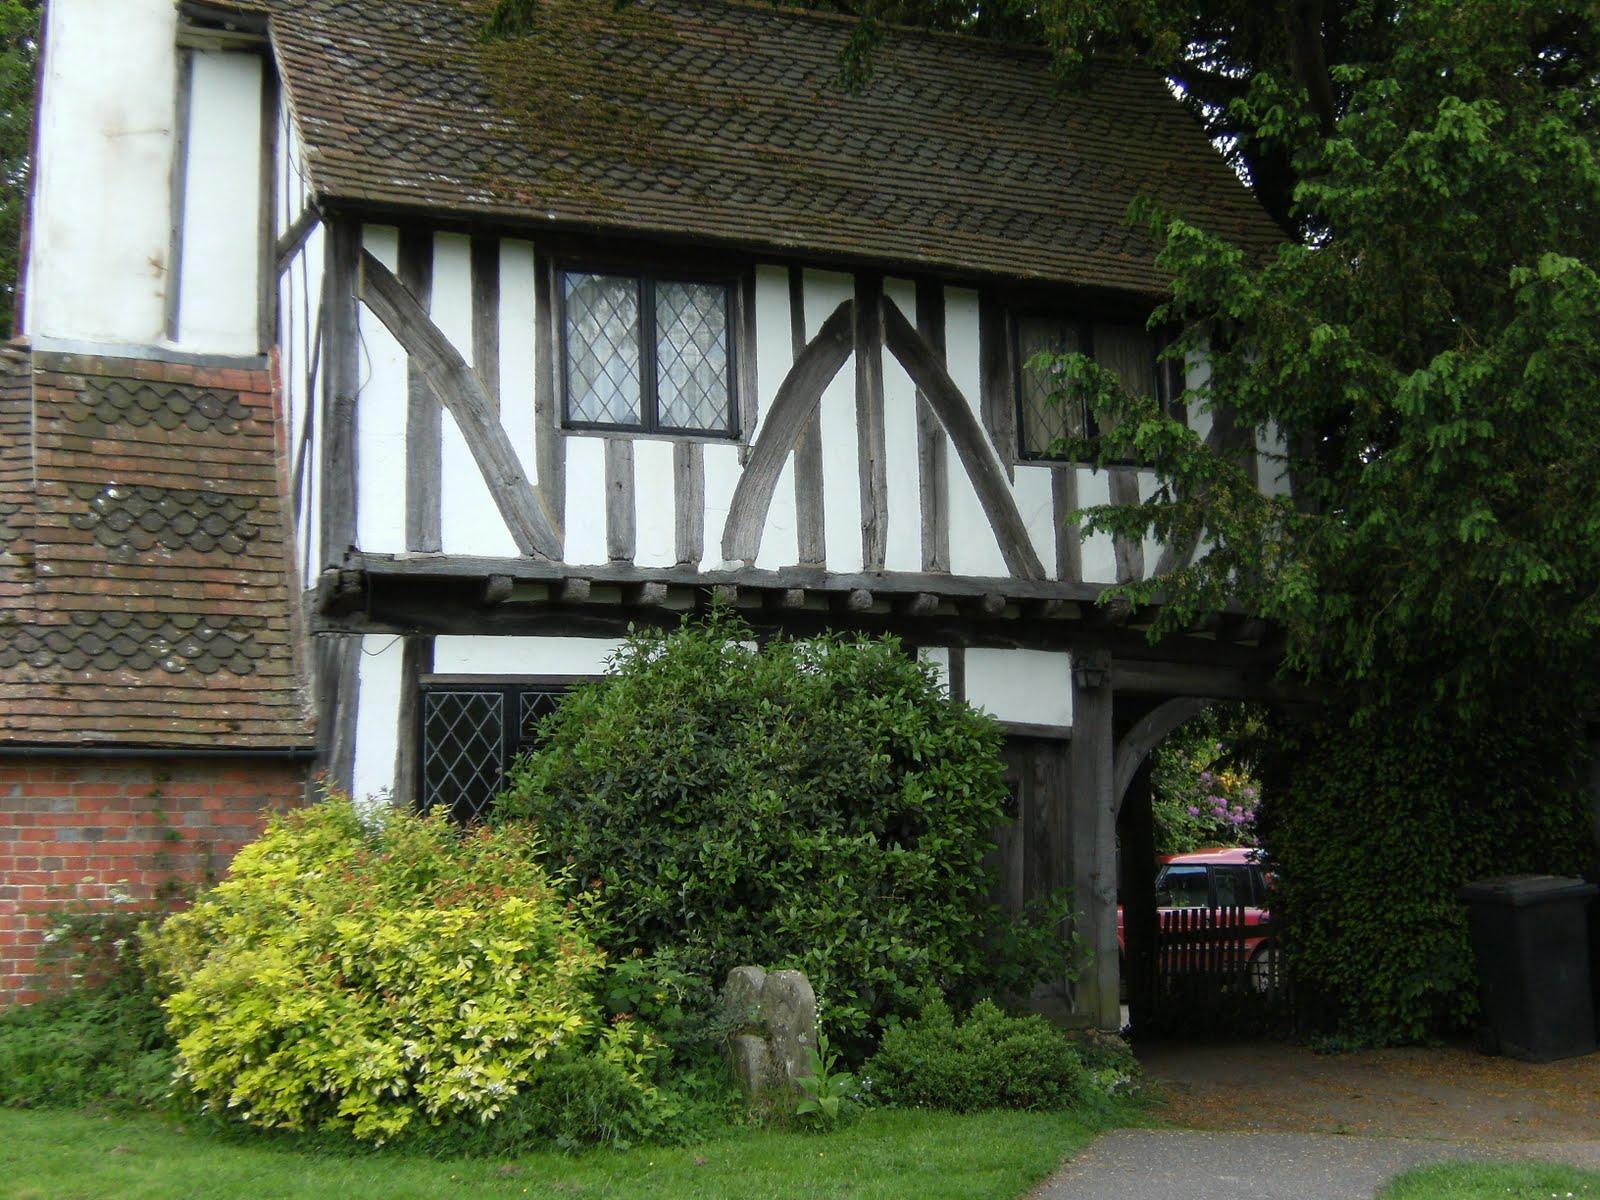 1006120070 Lych Gate Cottage, Hartfield